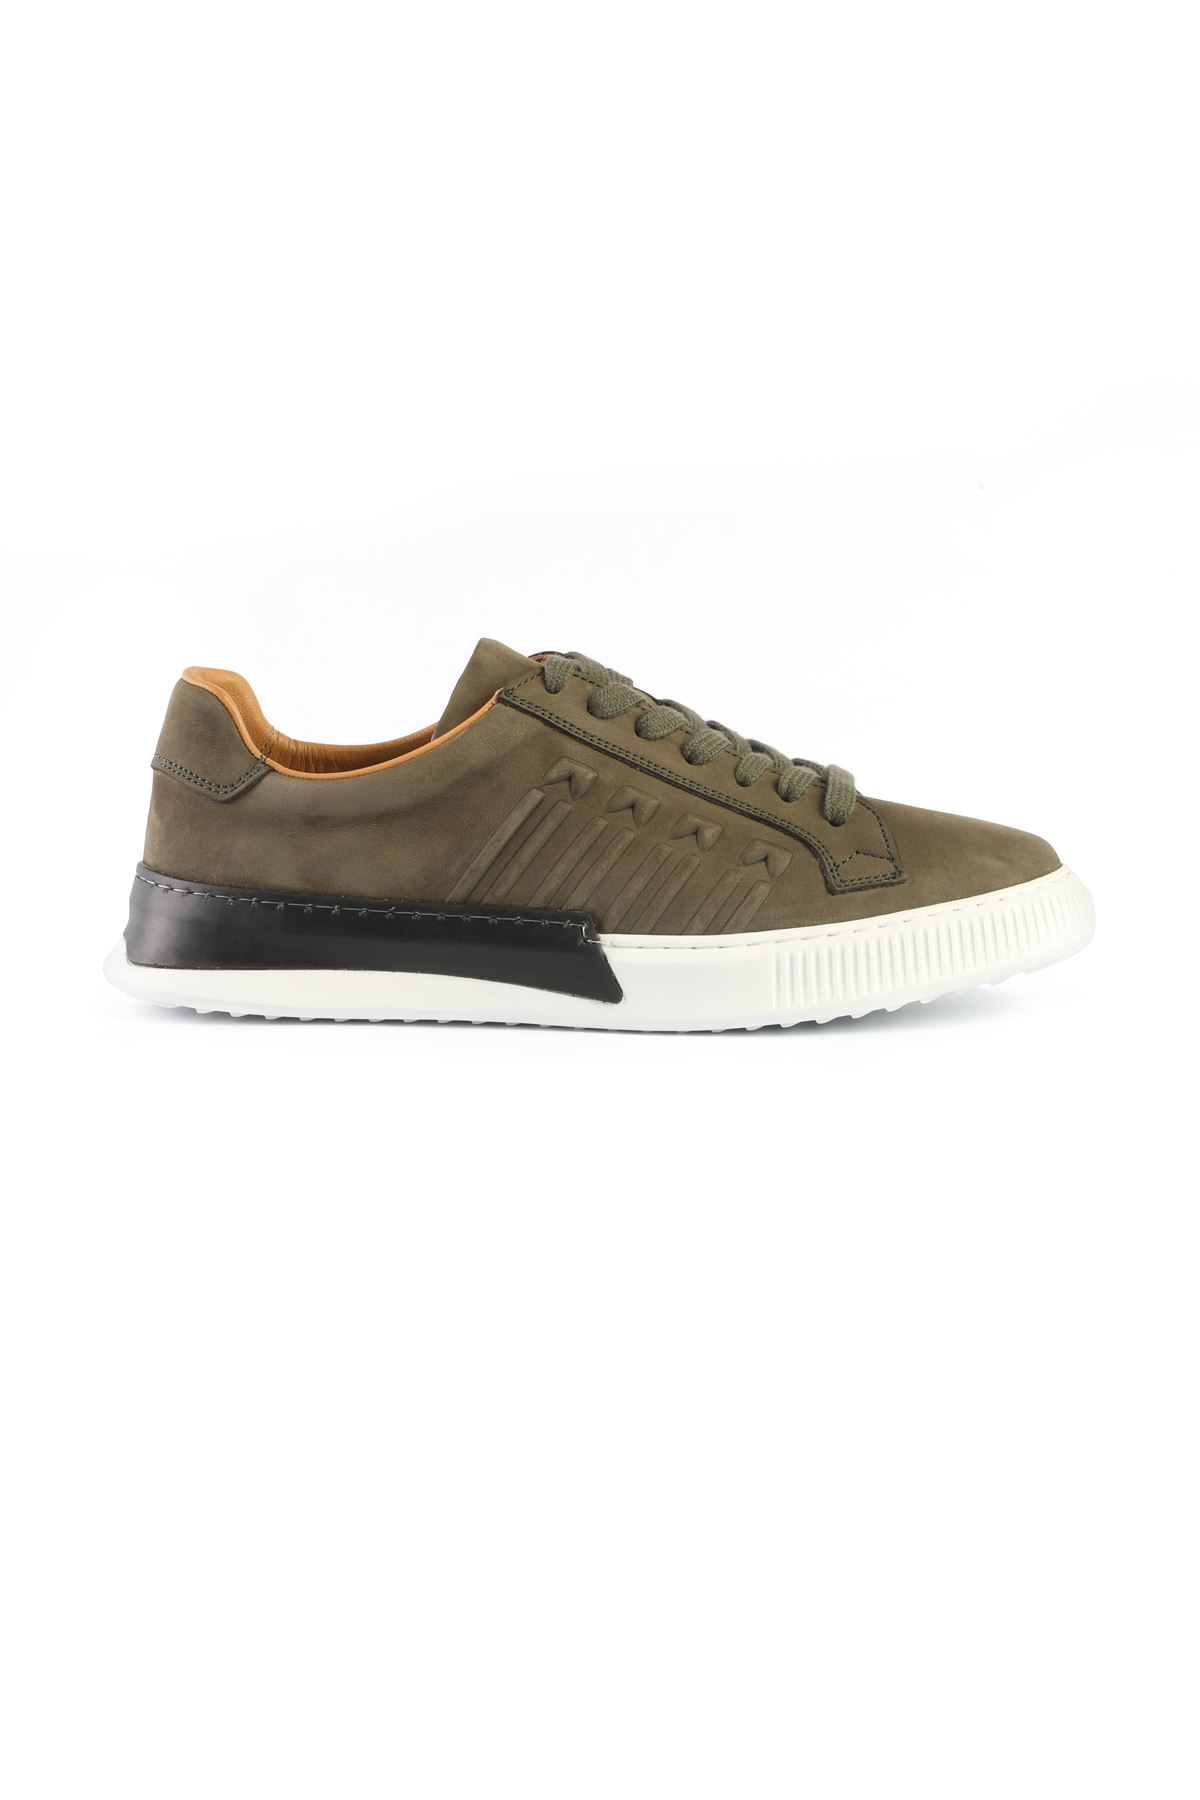 Libero L3438 Khaki Casual Shoes